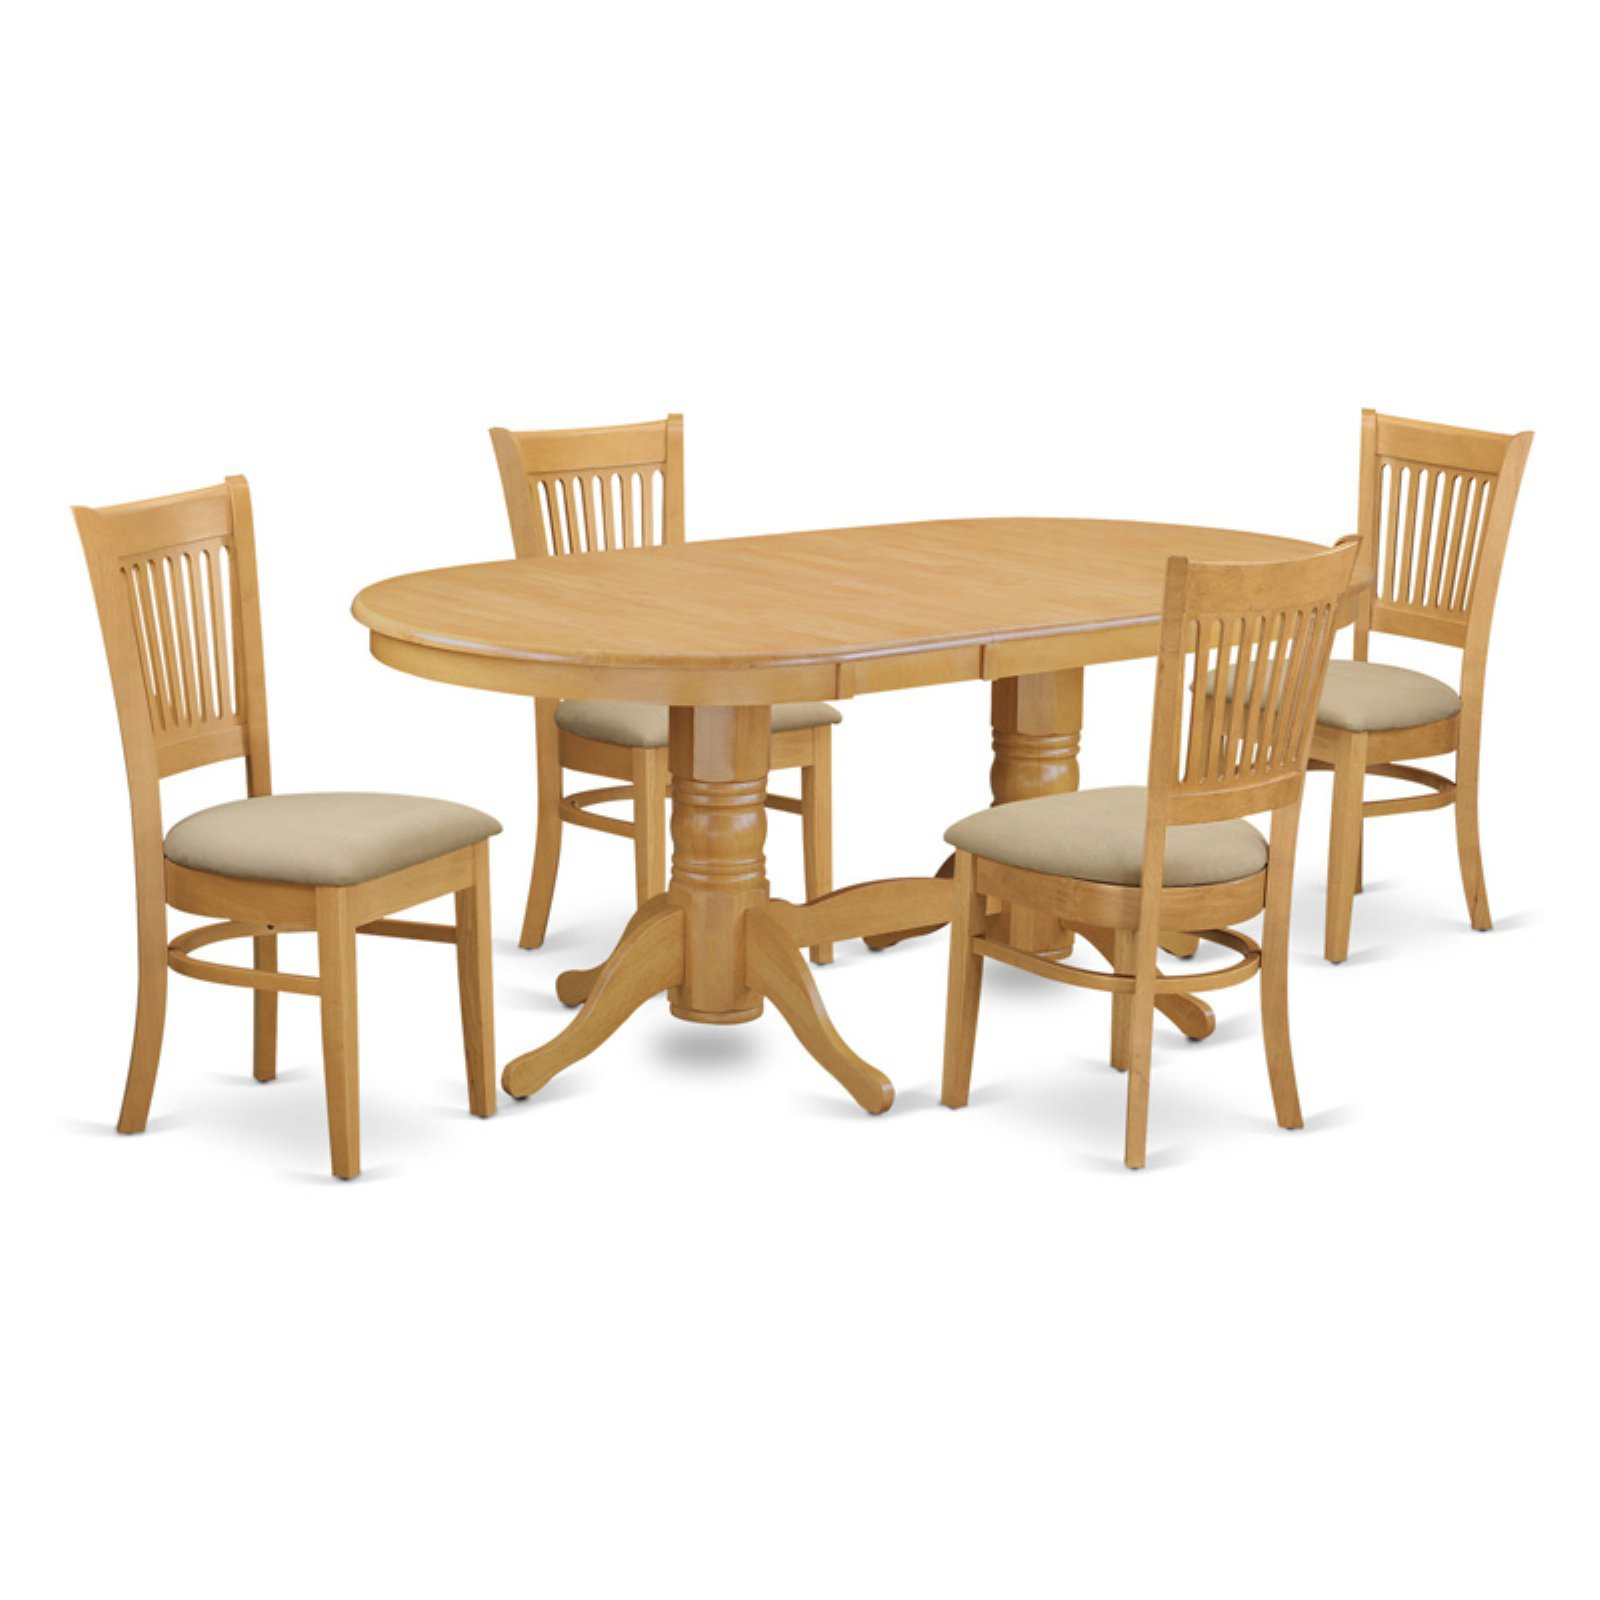 East west furniture vancouver 5 piece hepplewhite modern dining table set walmart com